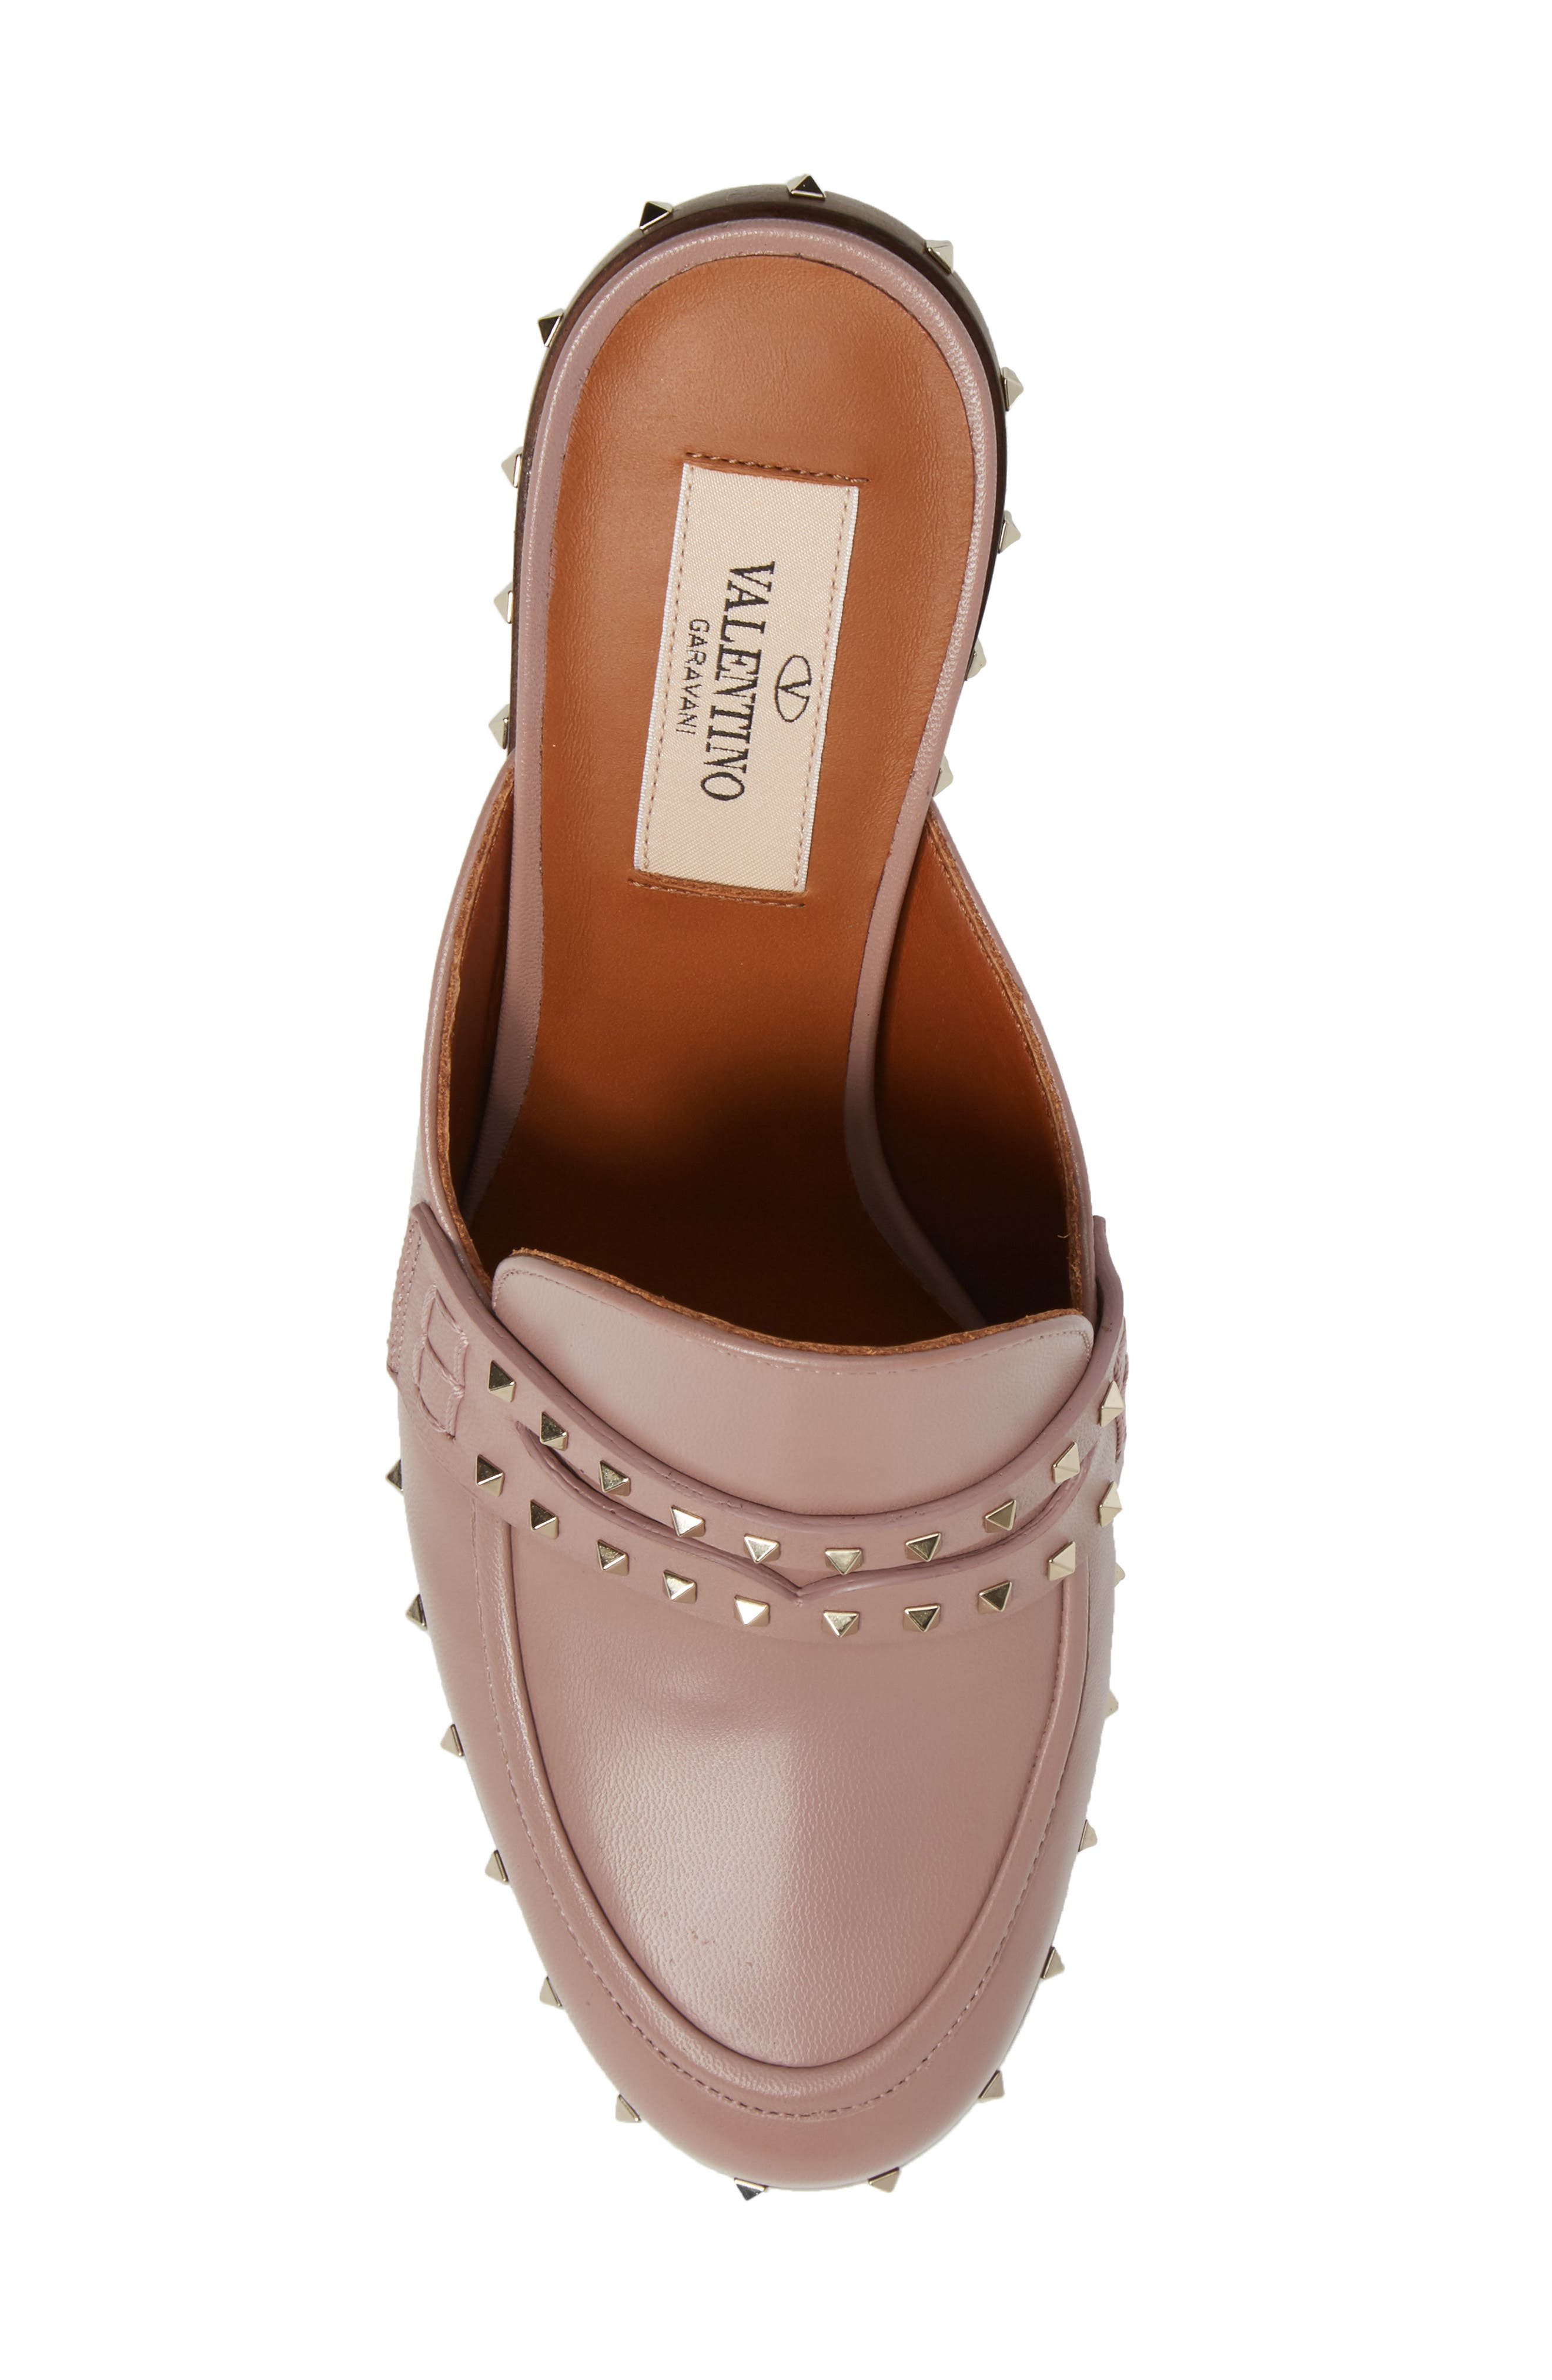 Rockstud Loafer Mule,                             Alternate thumbnail 5, color,                             Pink Leather